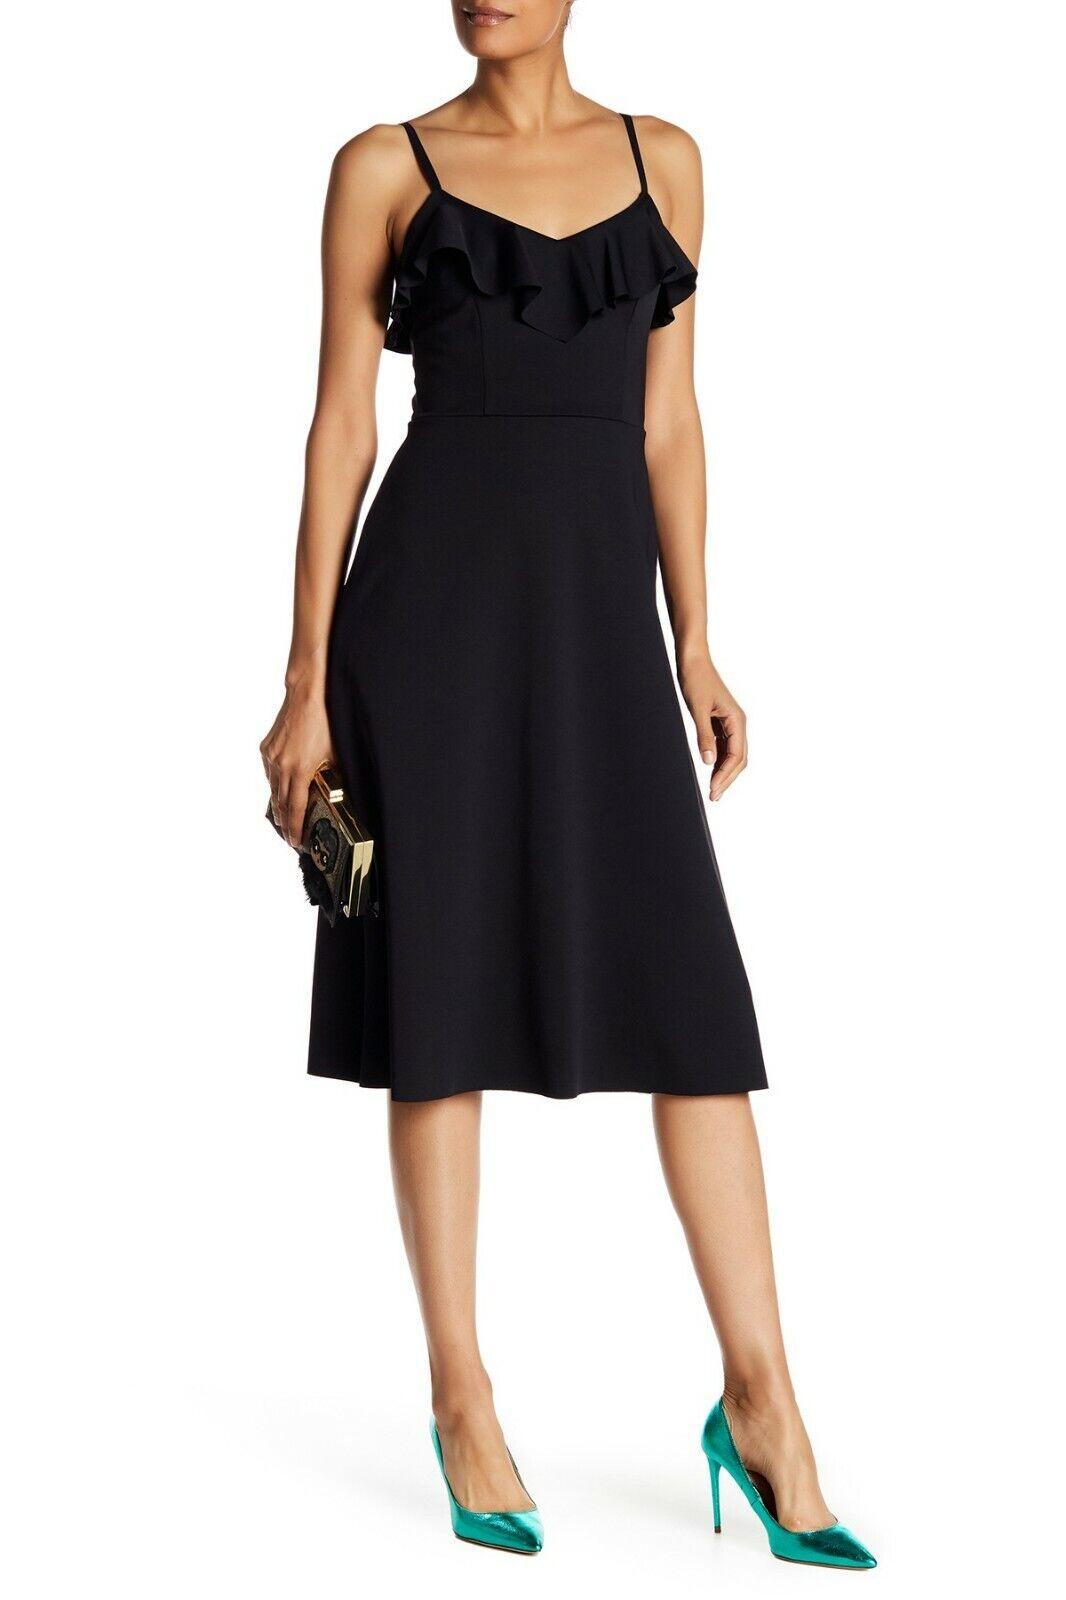 NWOT  Trina Turk Nifty Midi Dress 14